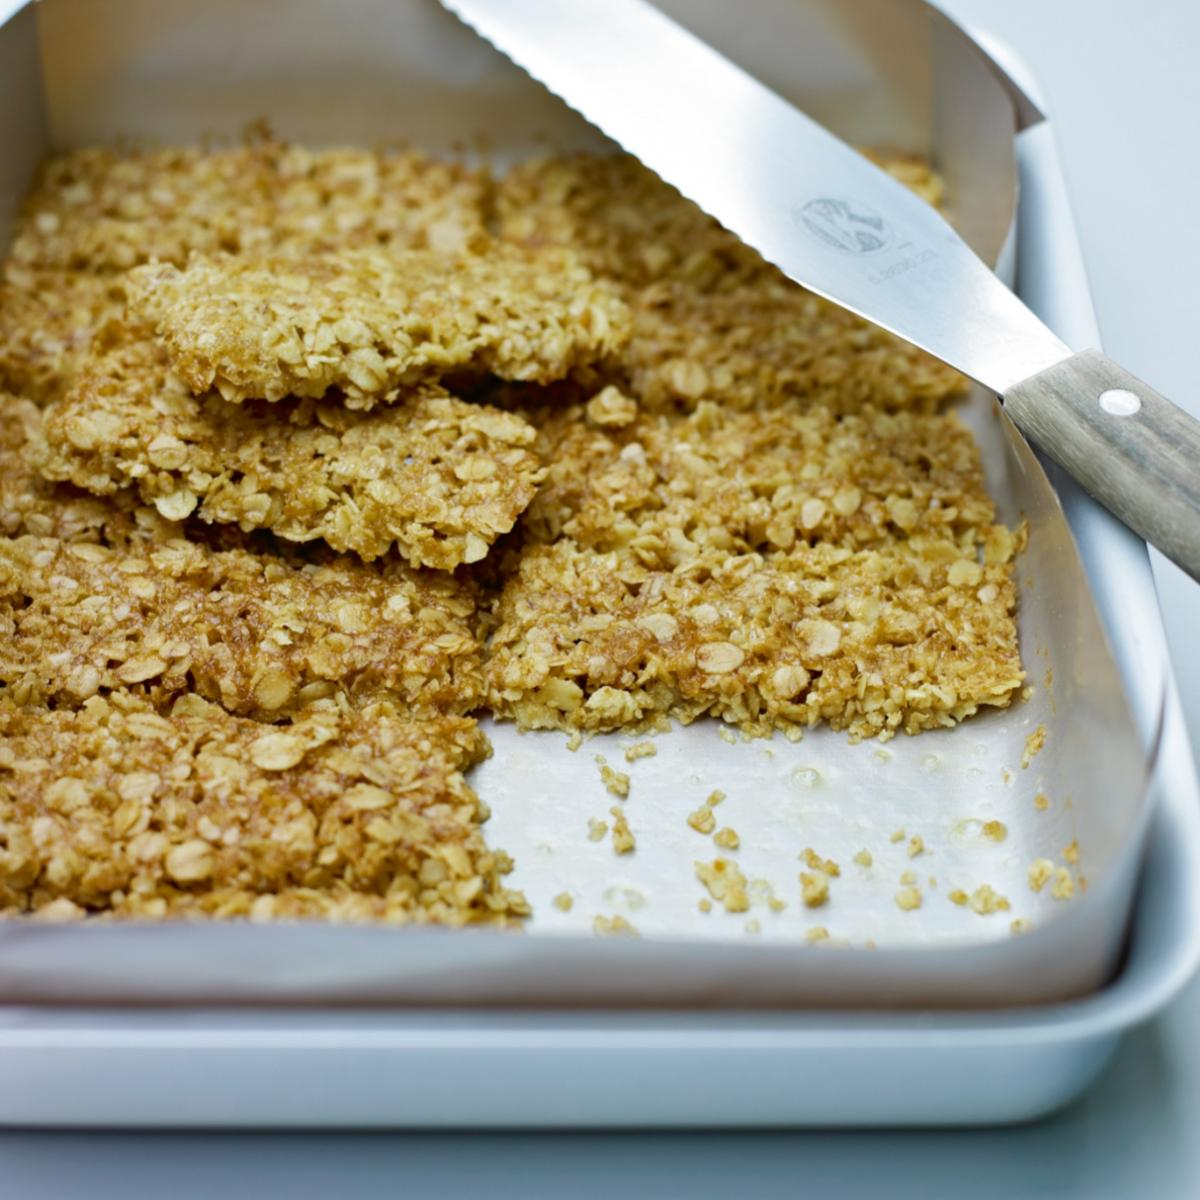 A picture of Delia's Whole Oat Crunchies recipe